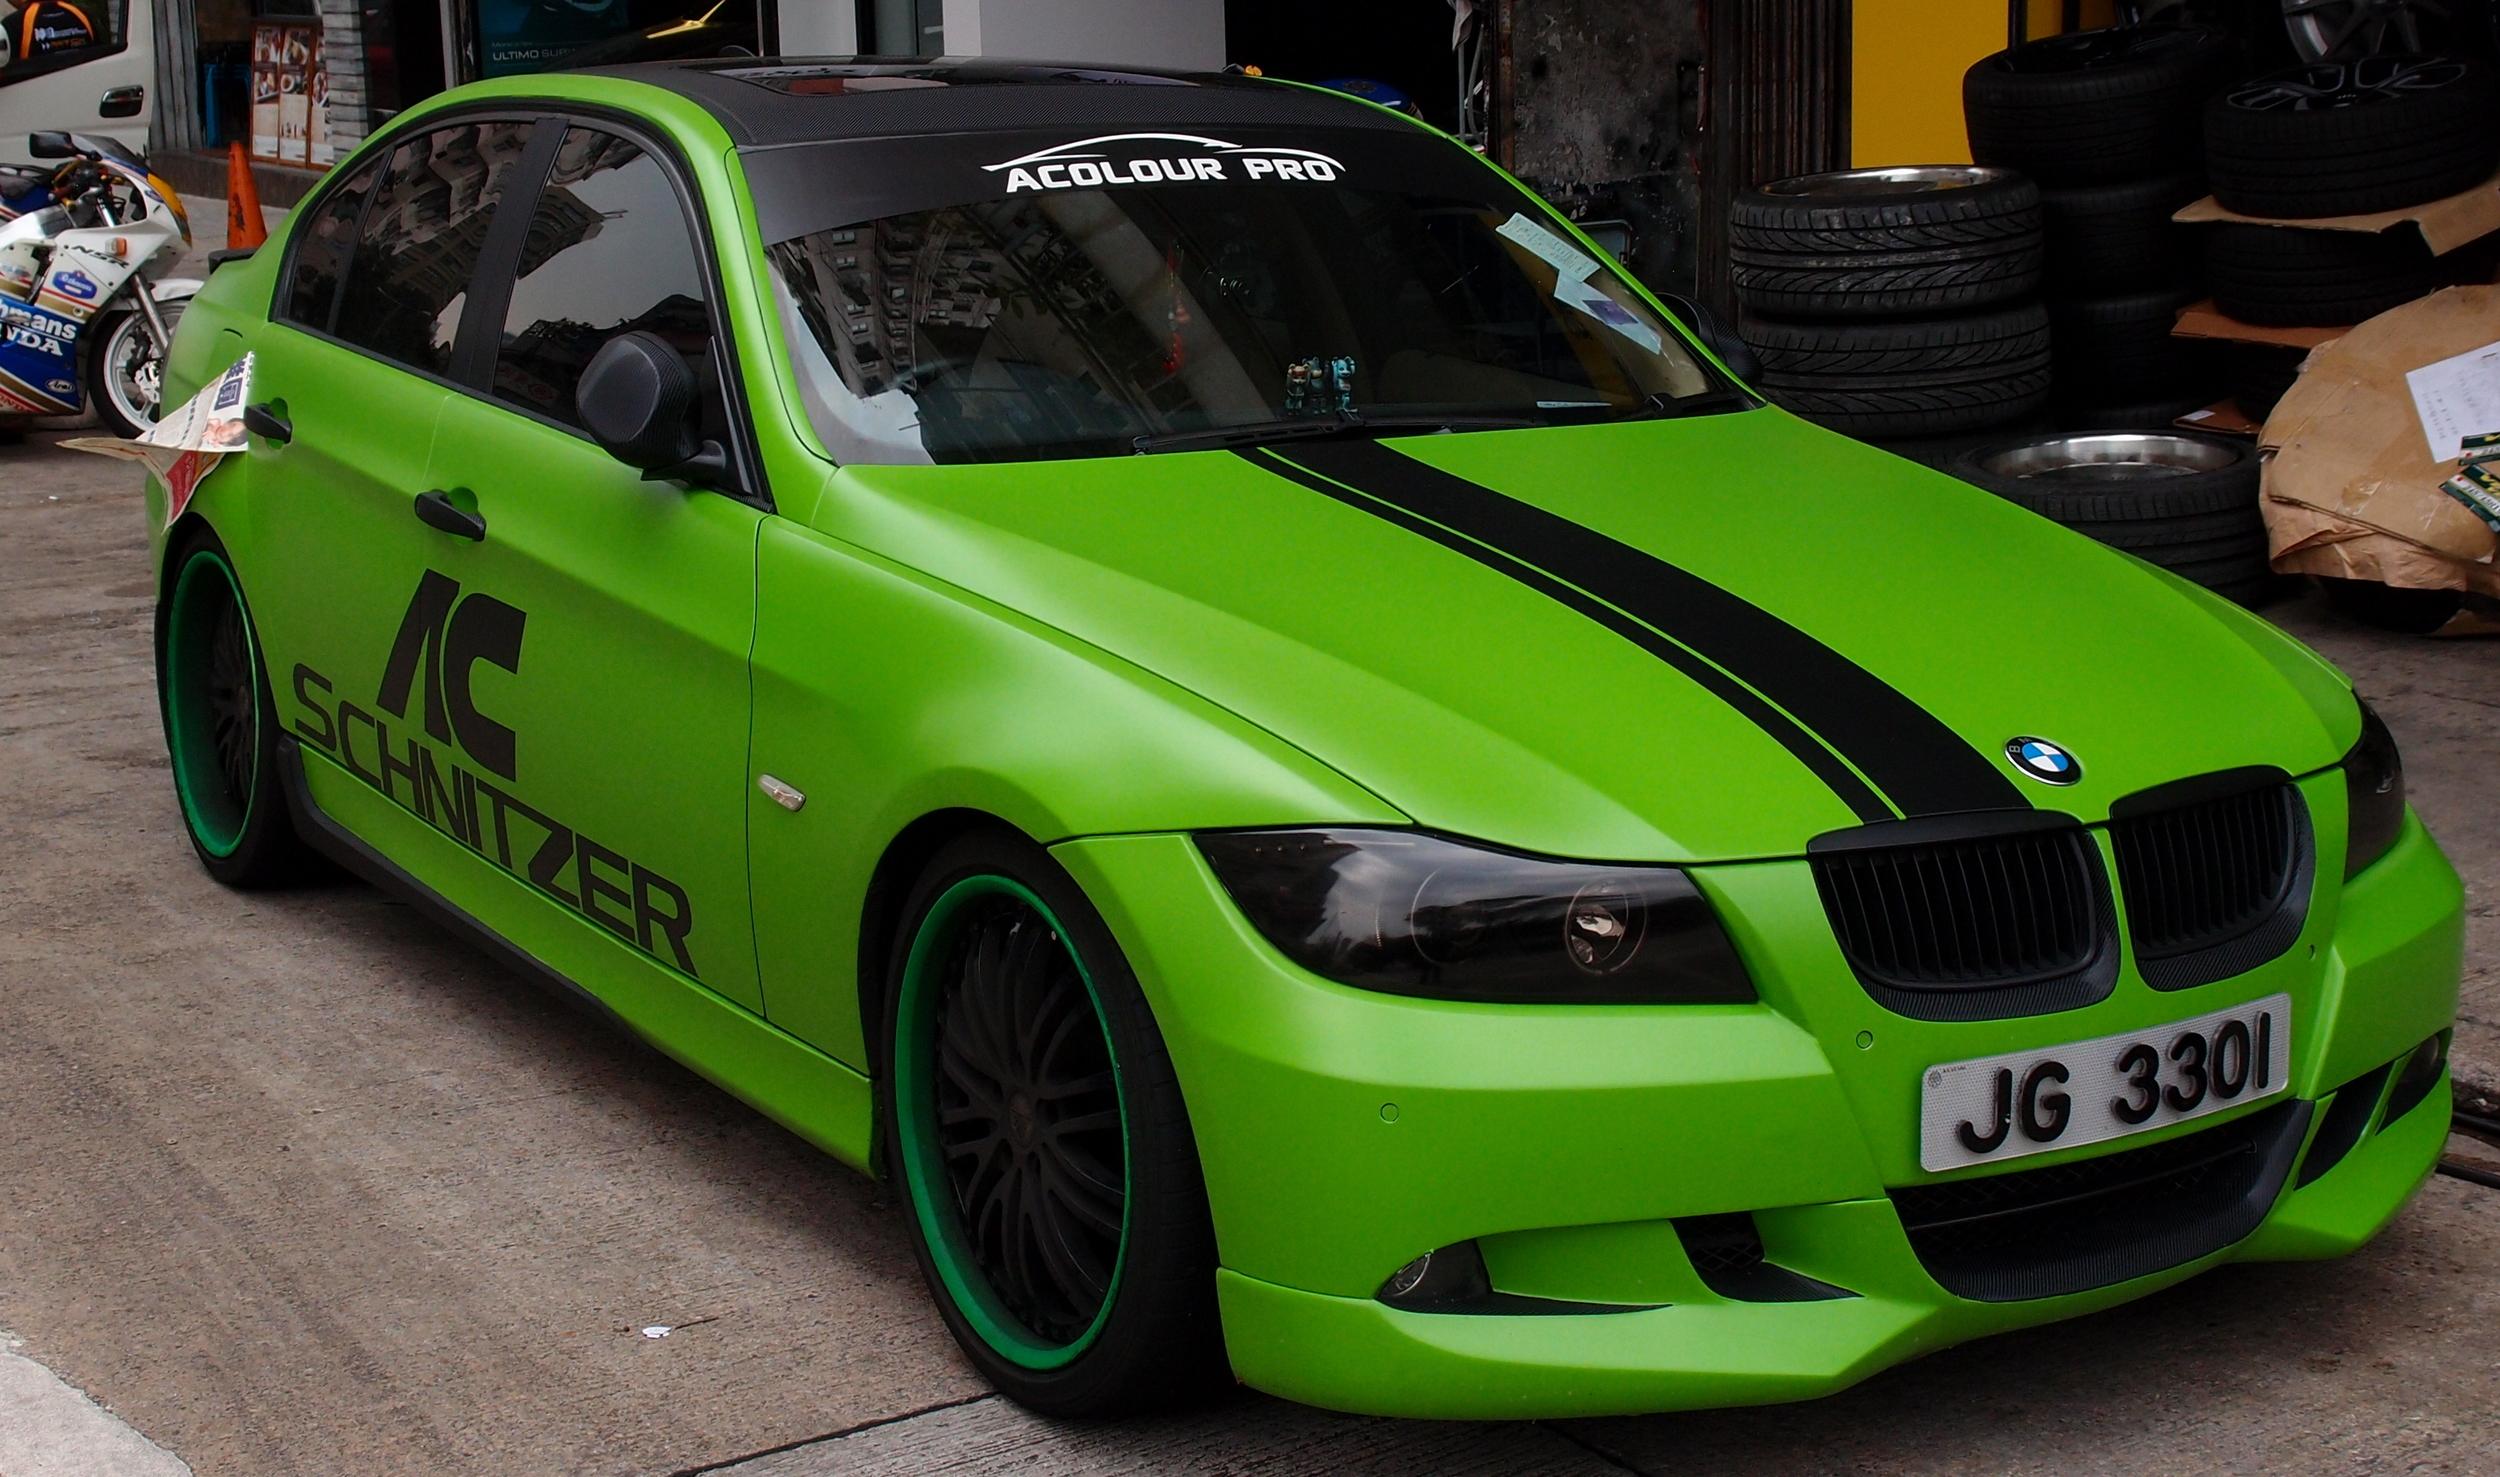 Interesting colour scheme for a BMW